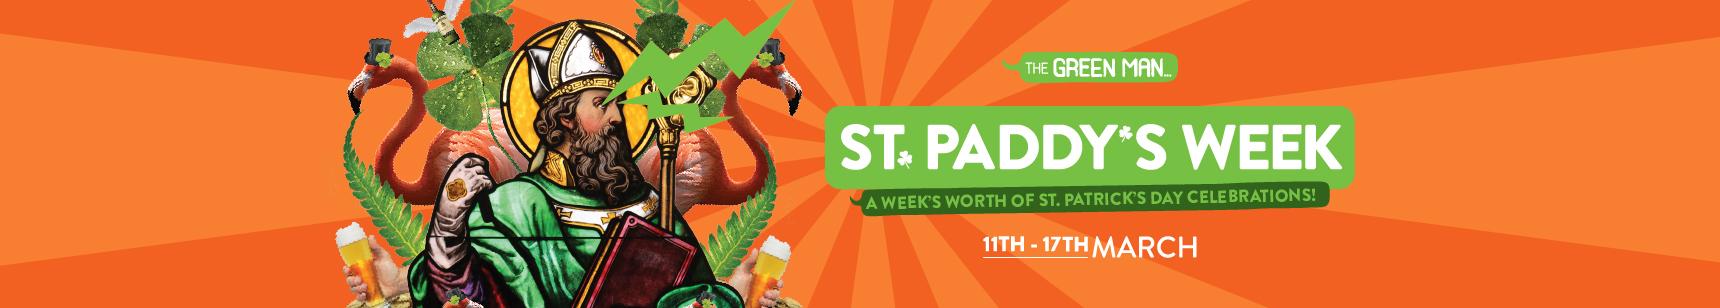 St Paddy's Week